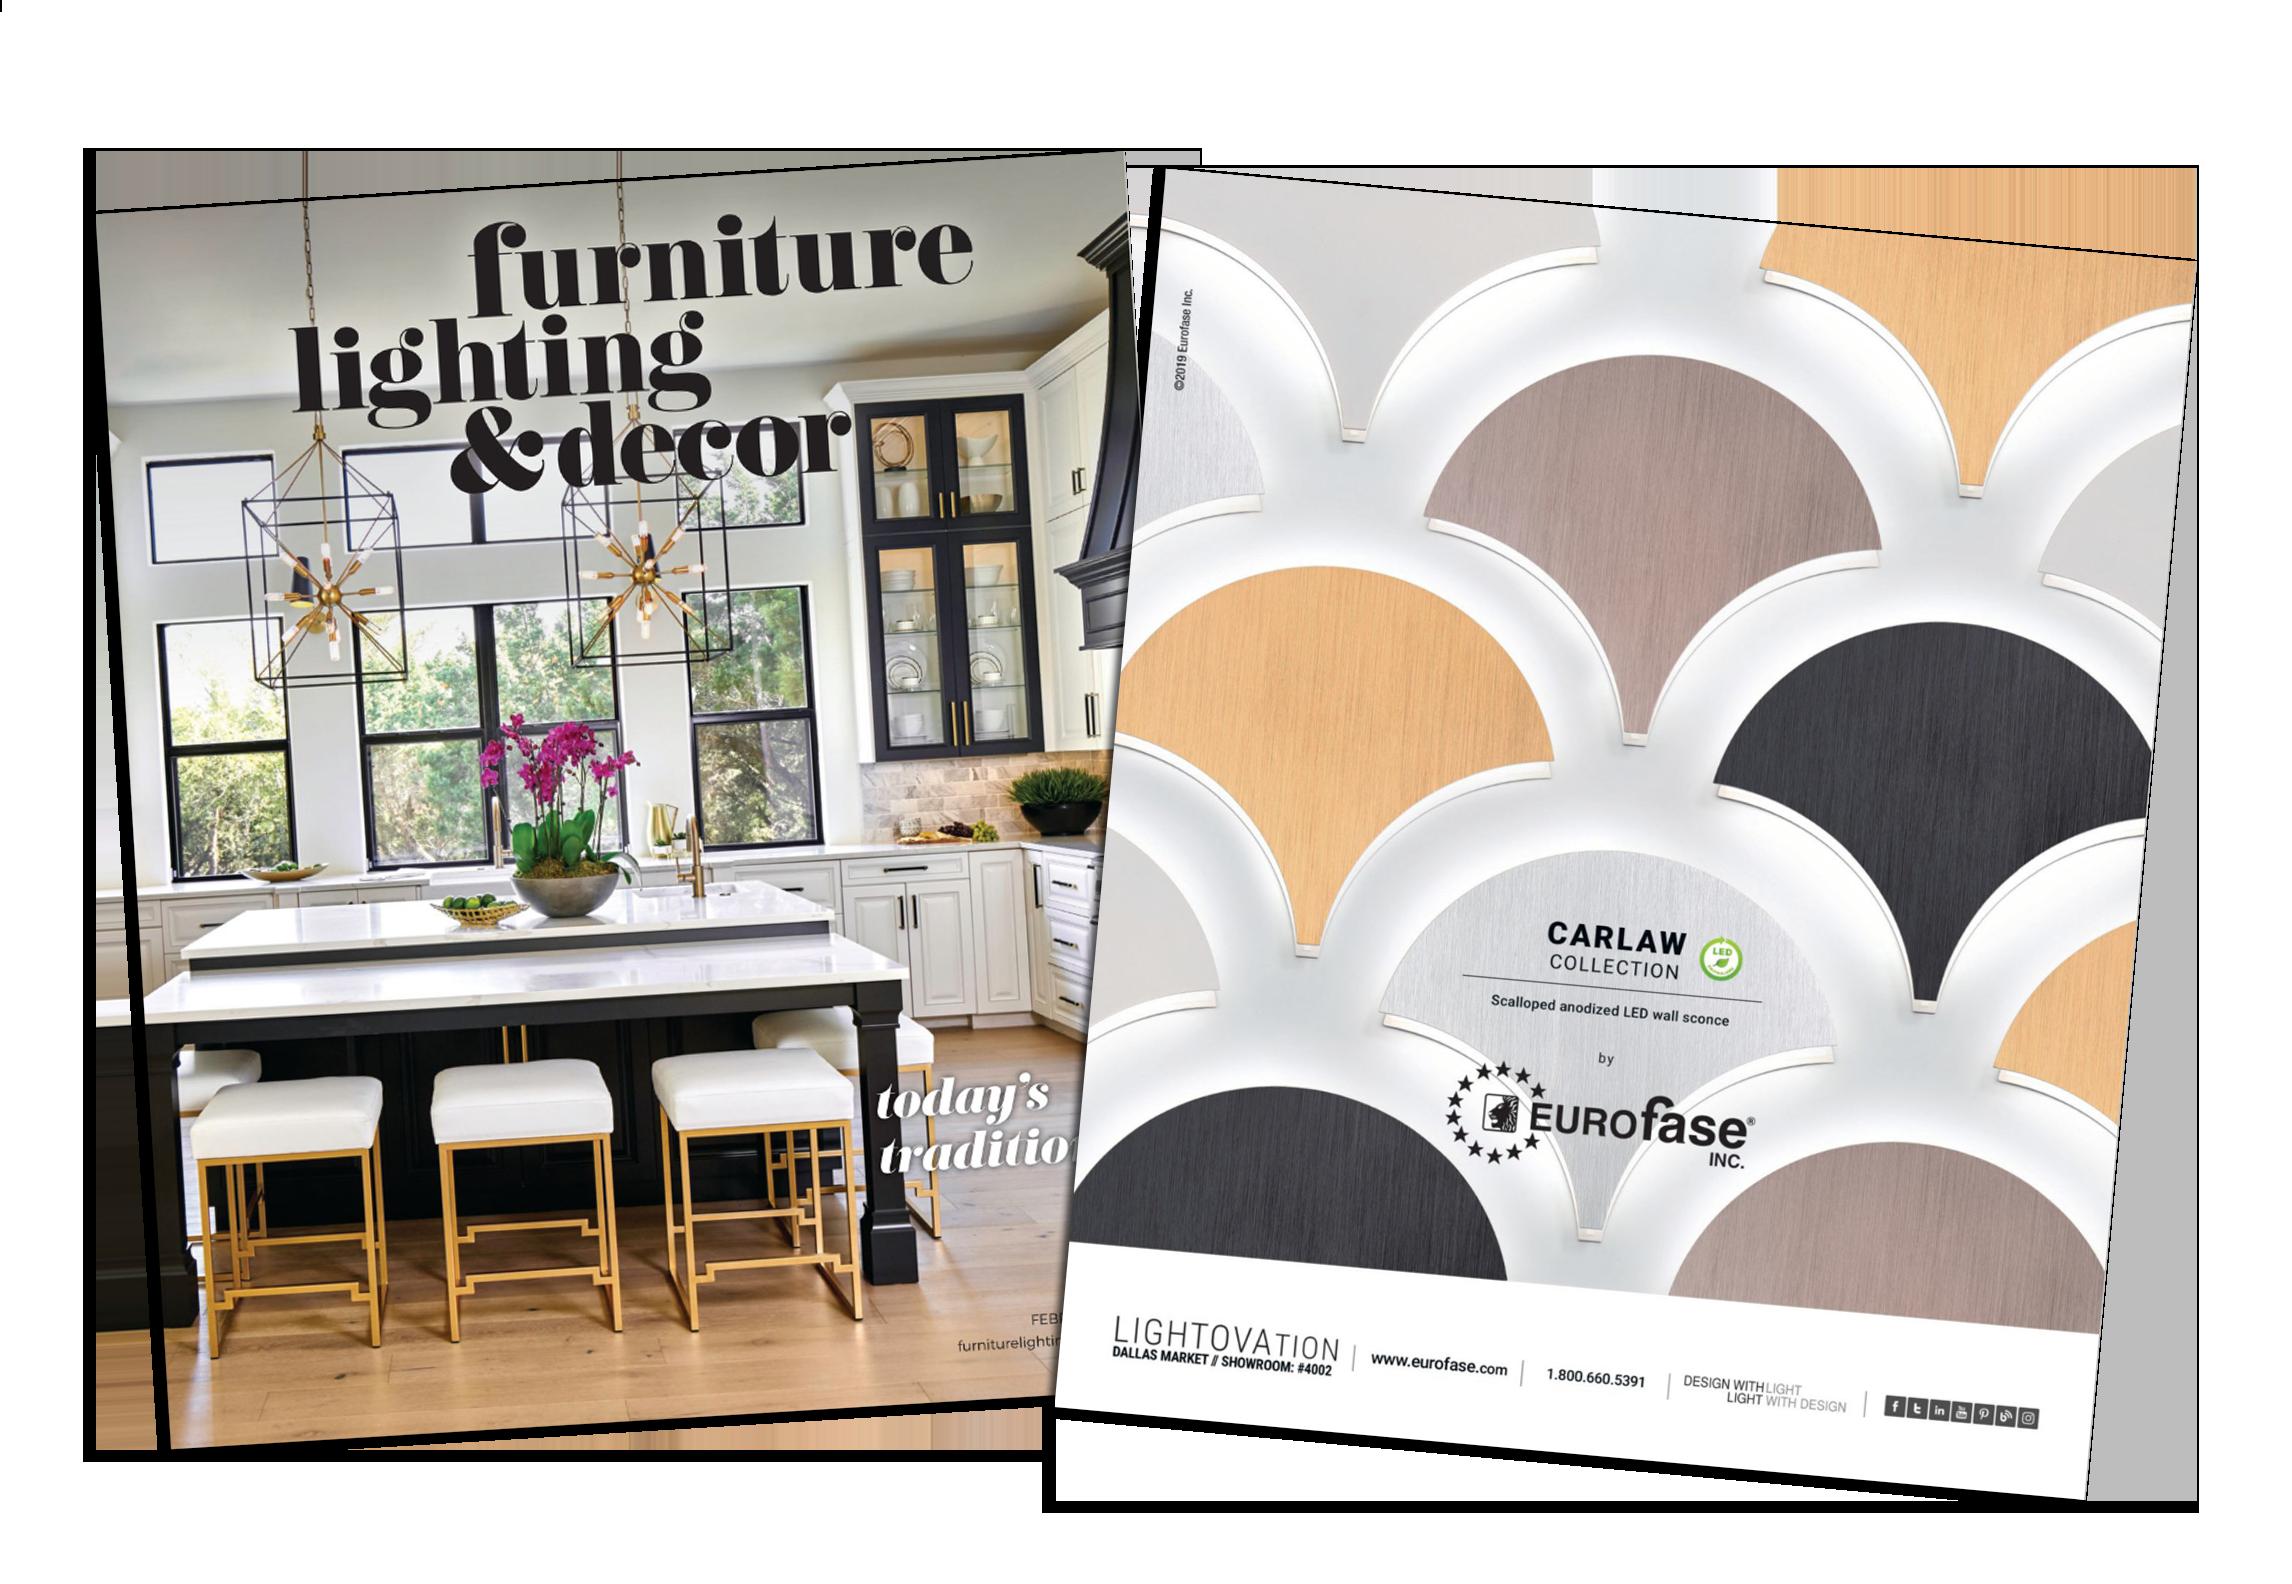 Furniture Lighting Decor February 2019 Ad Interior Design